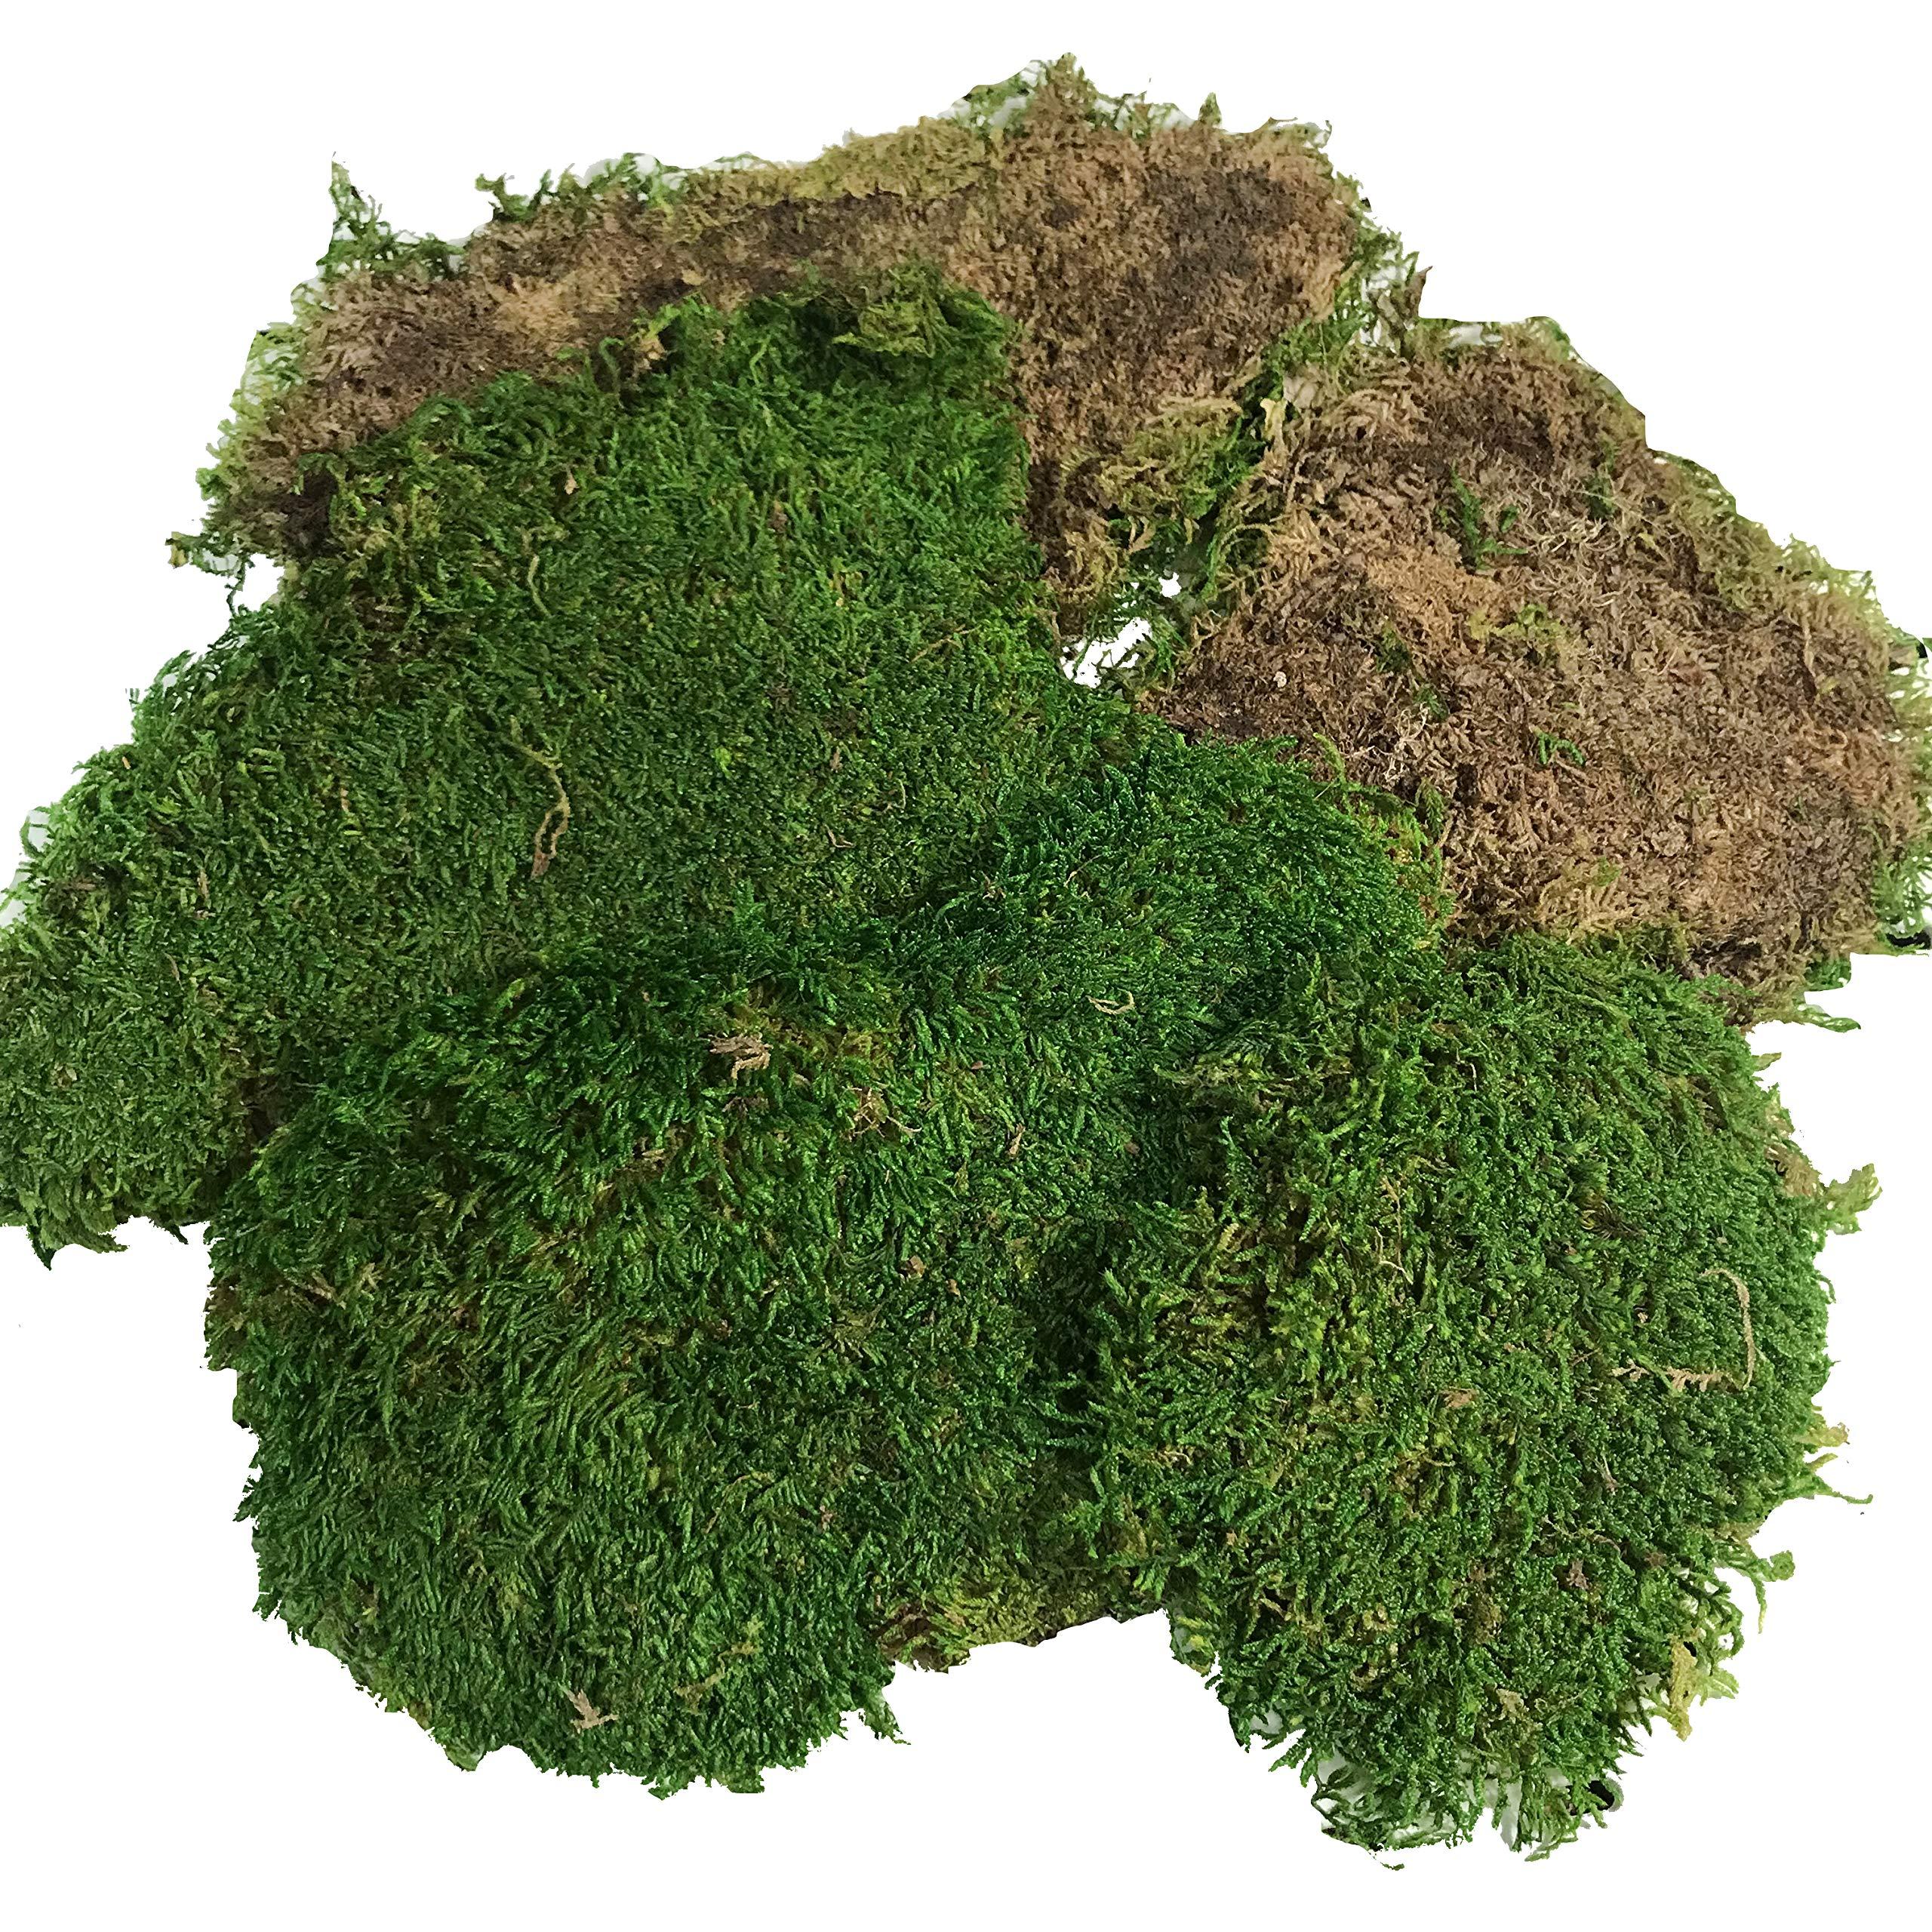 Pack of 2.5oz Preserved Moss Reindeer Moss Floral Moss